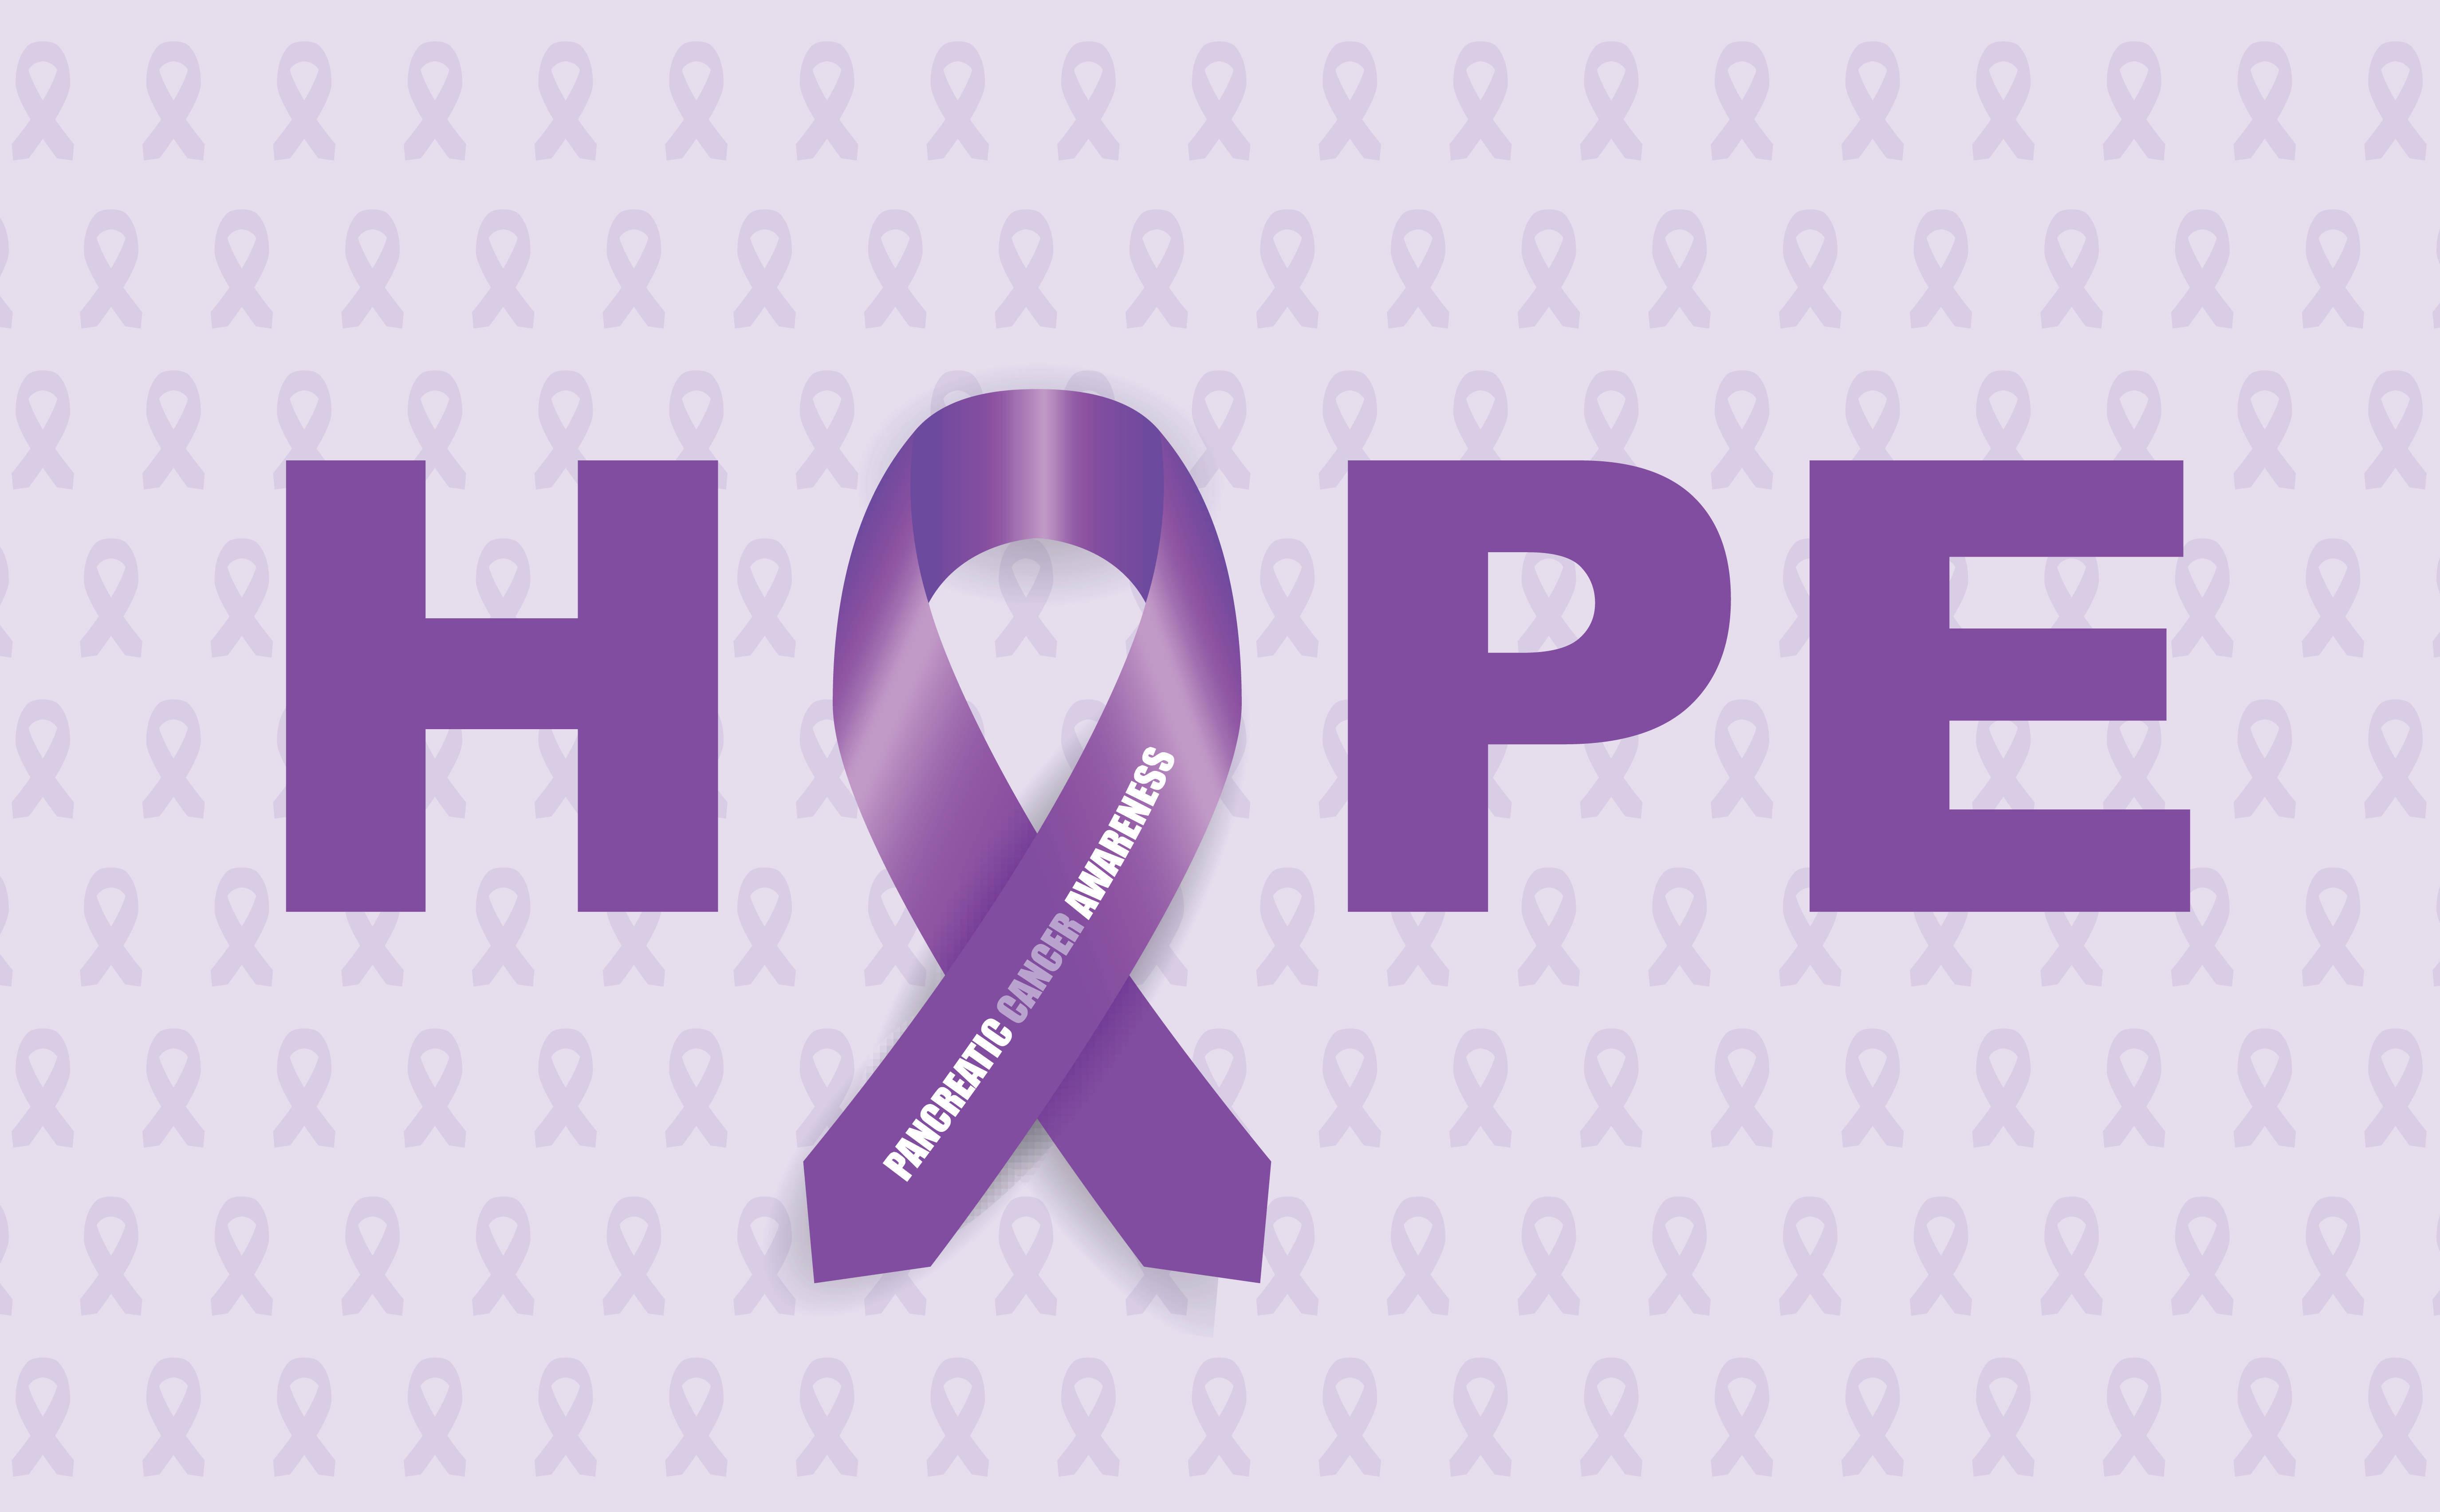 c4e717fa639950a1871f_Pancreatic-Cancer.jpg